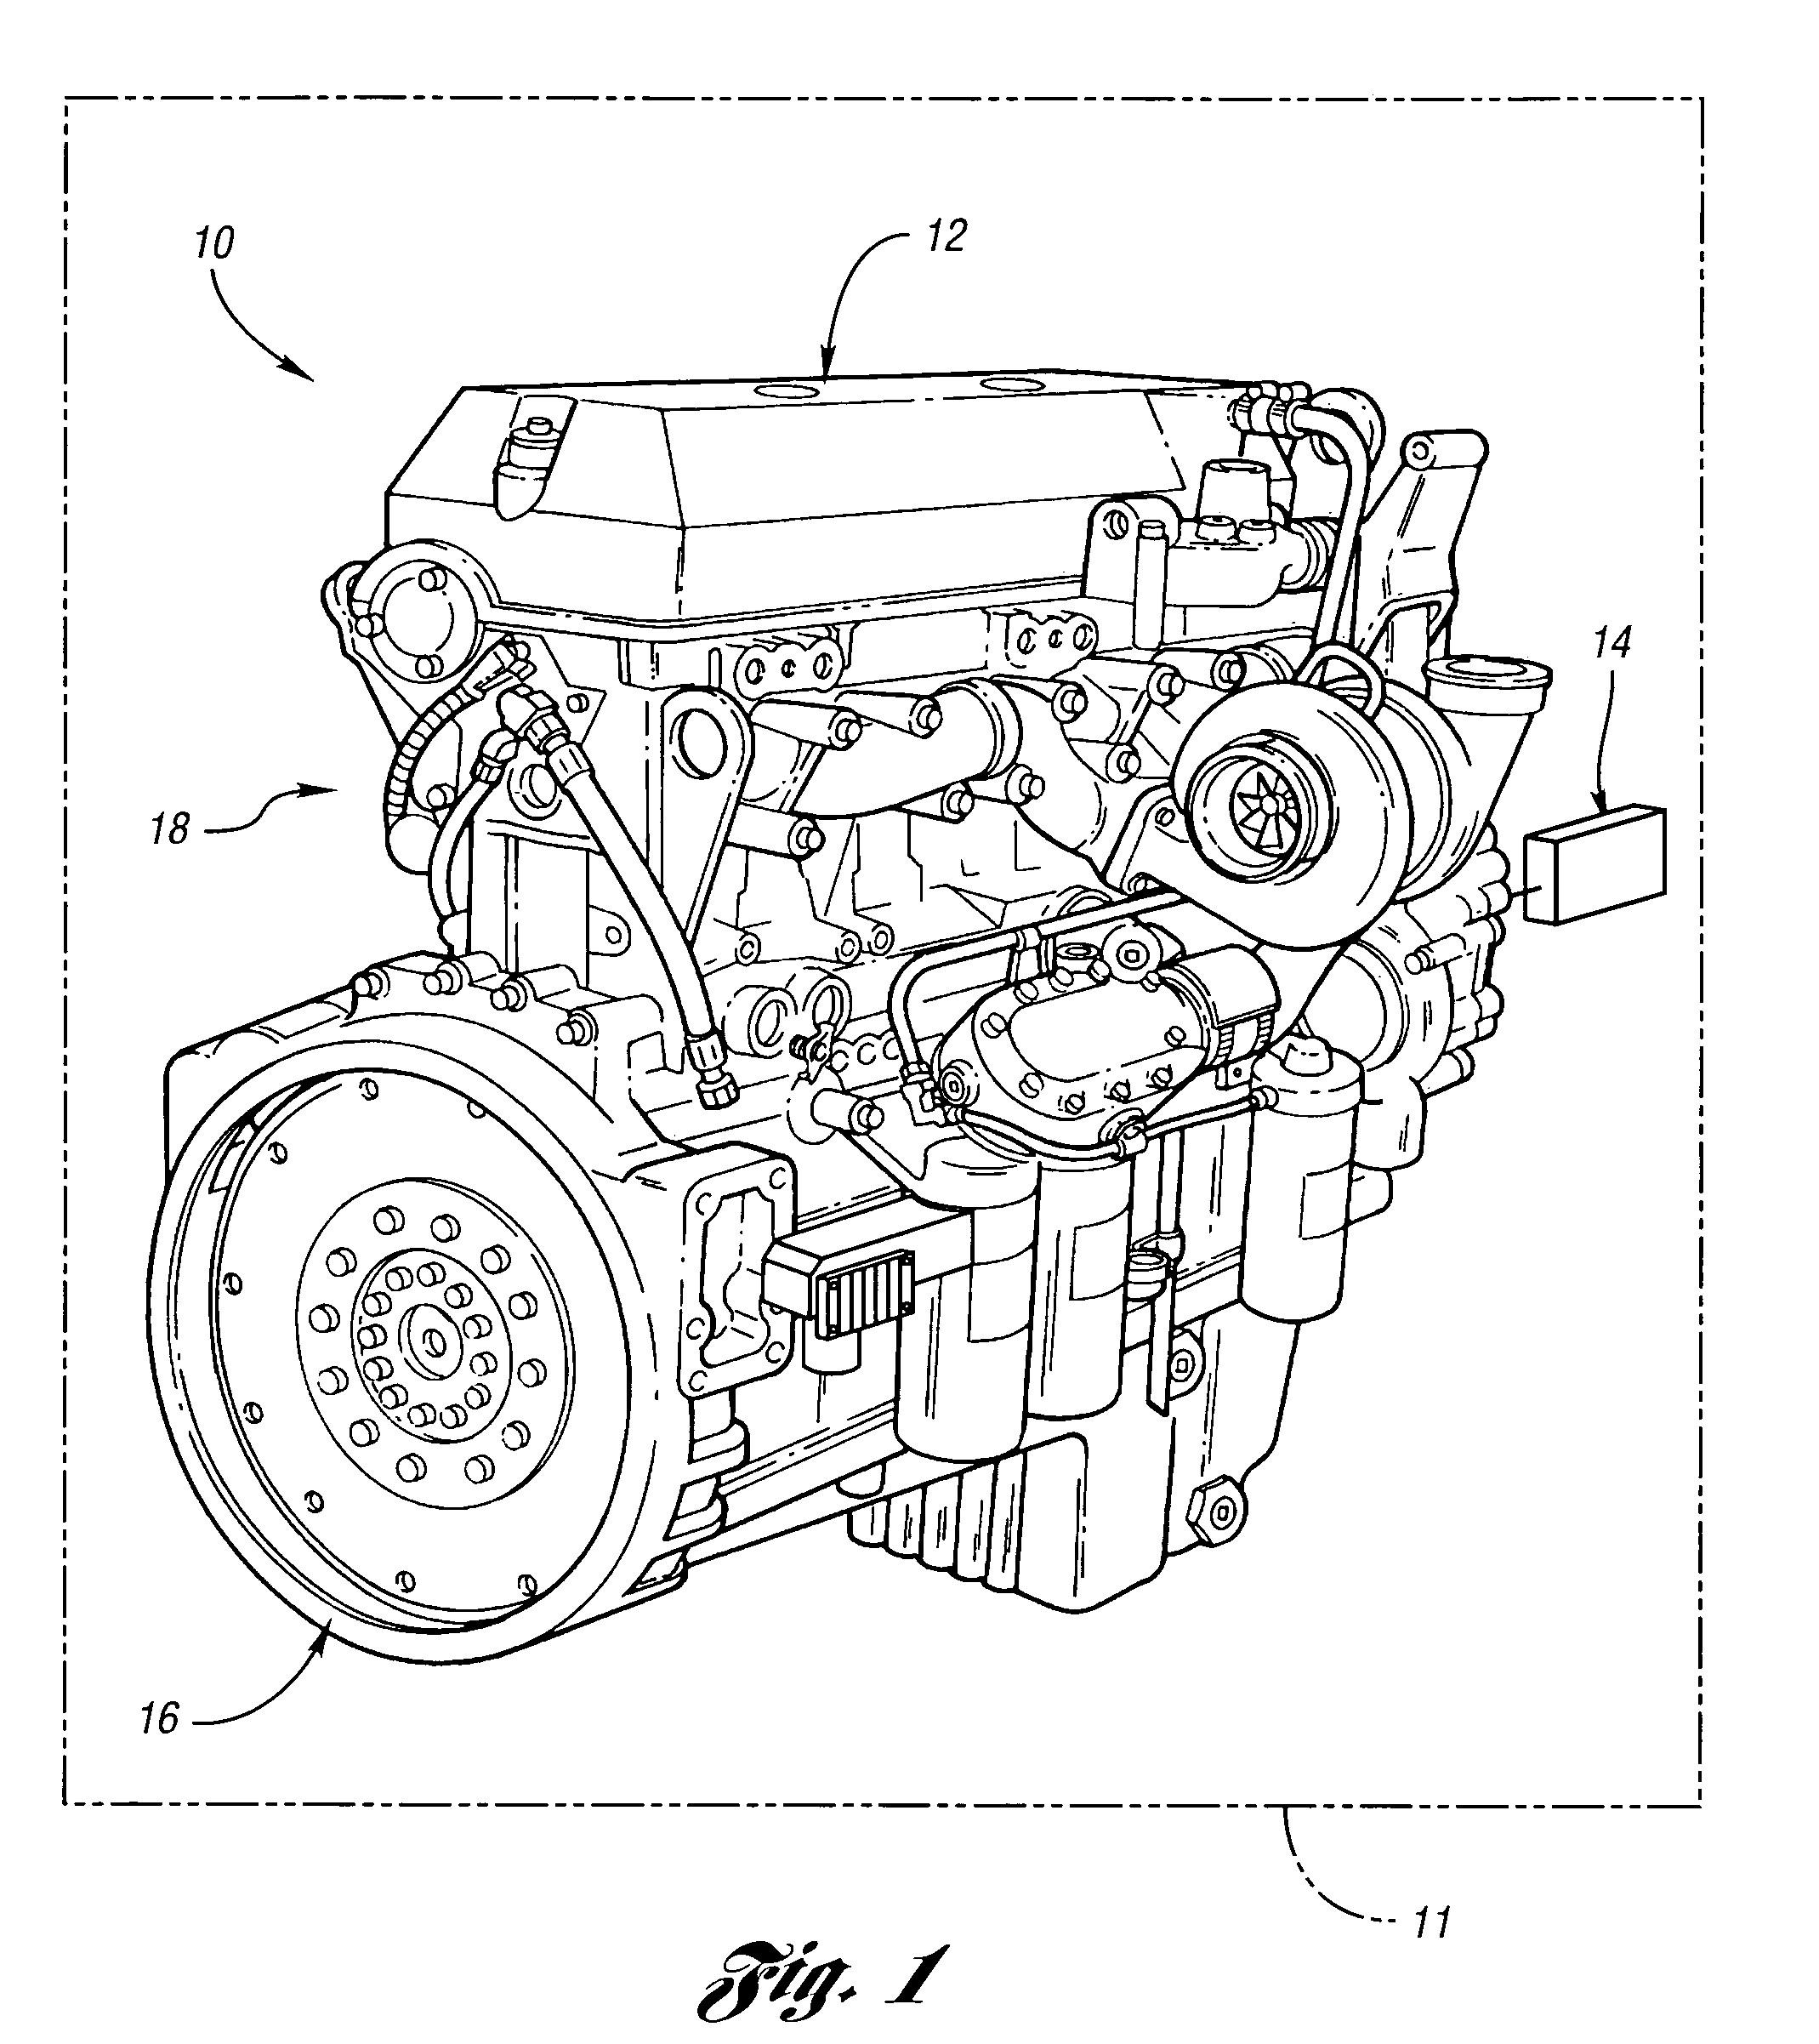 Detroitsel Series 60 Engine Diagram